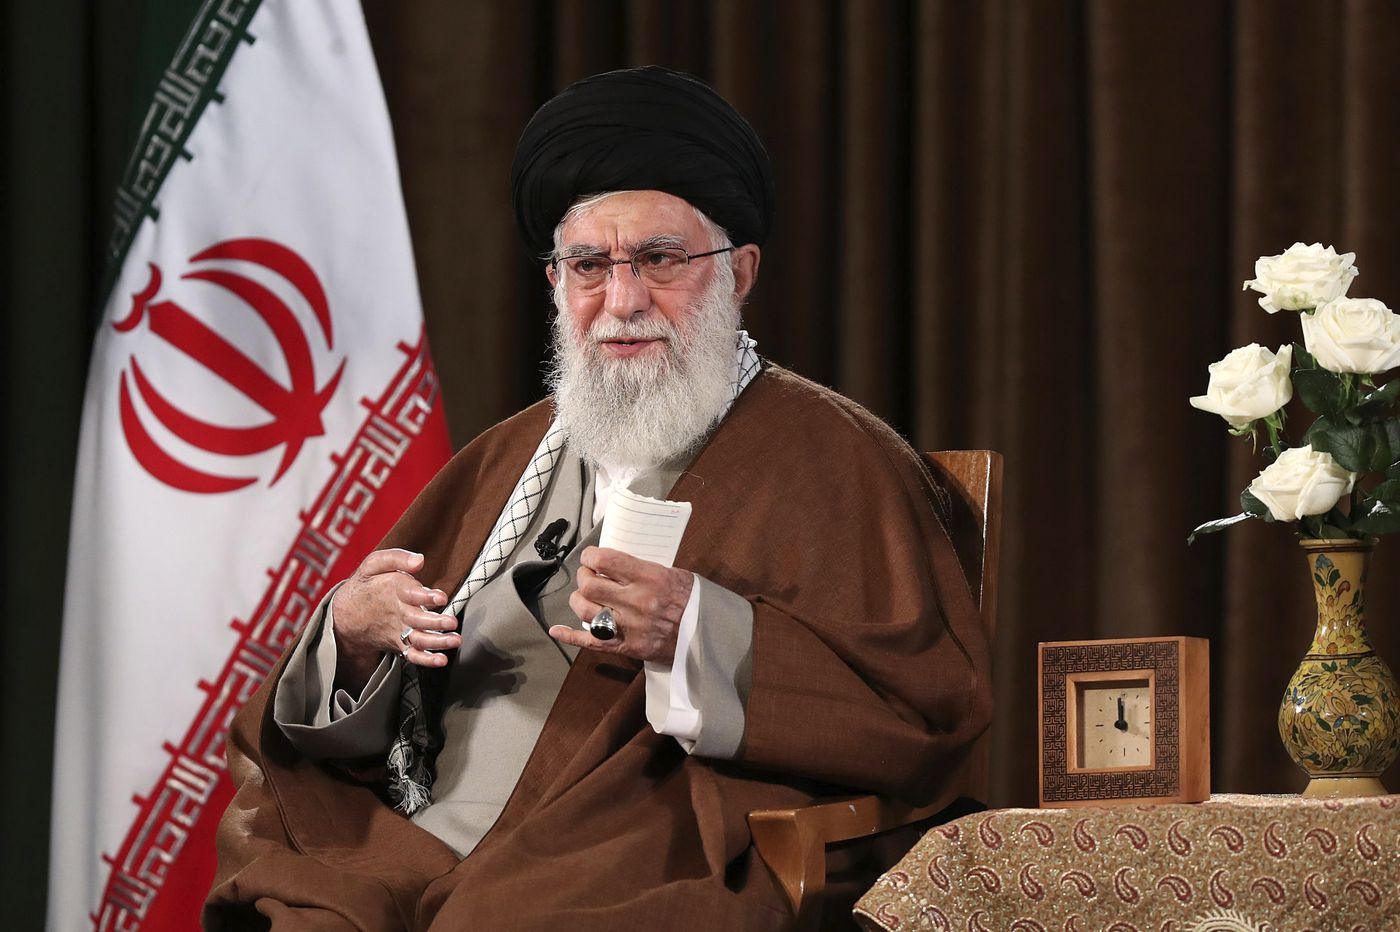 Iran leader refuses U.S. help, citing coronavirus conspiracy theory